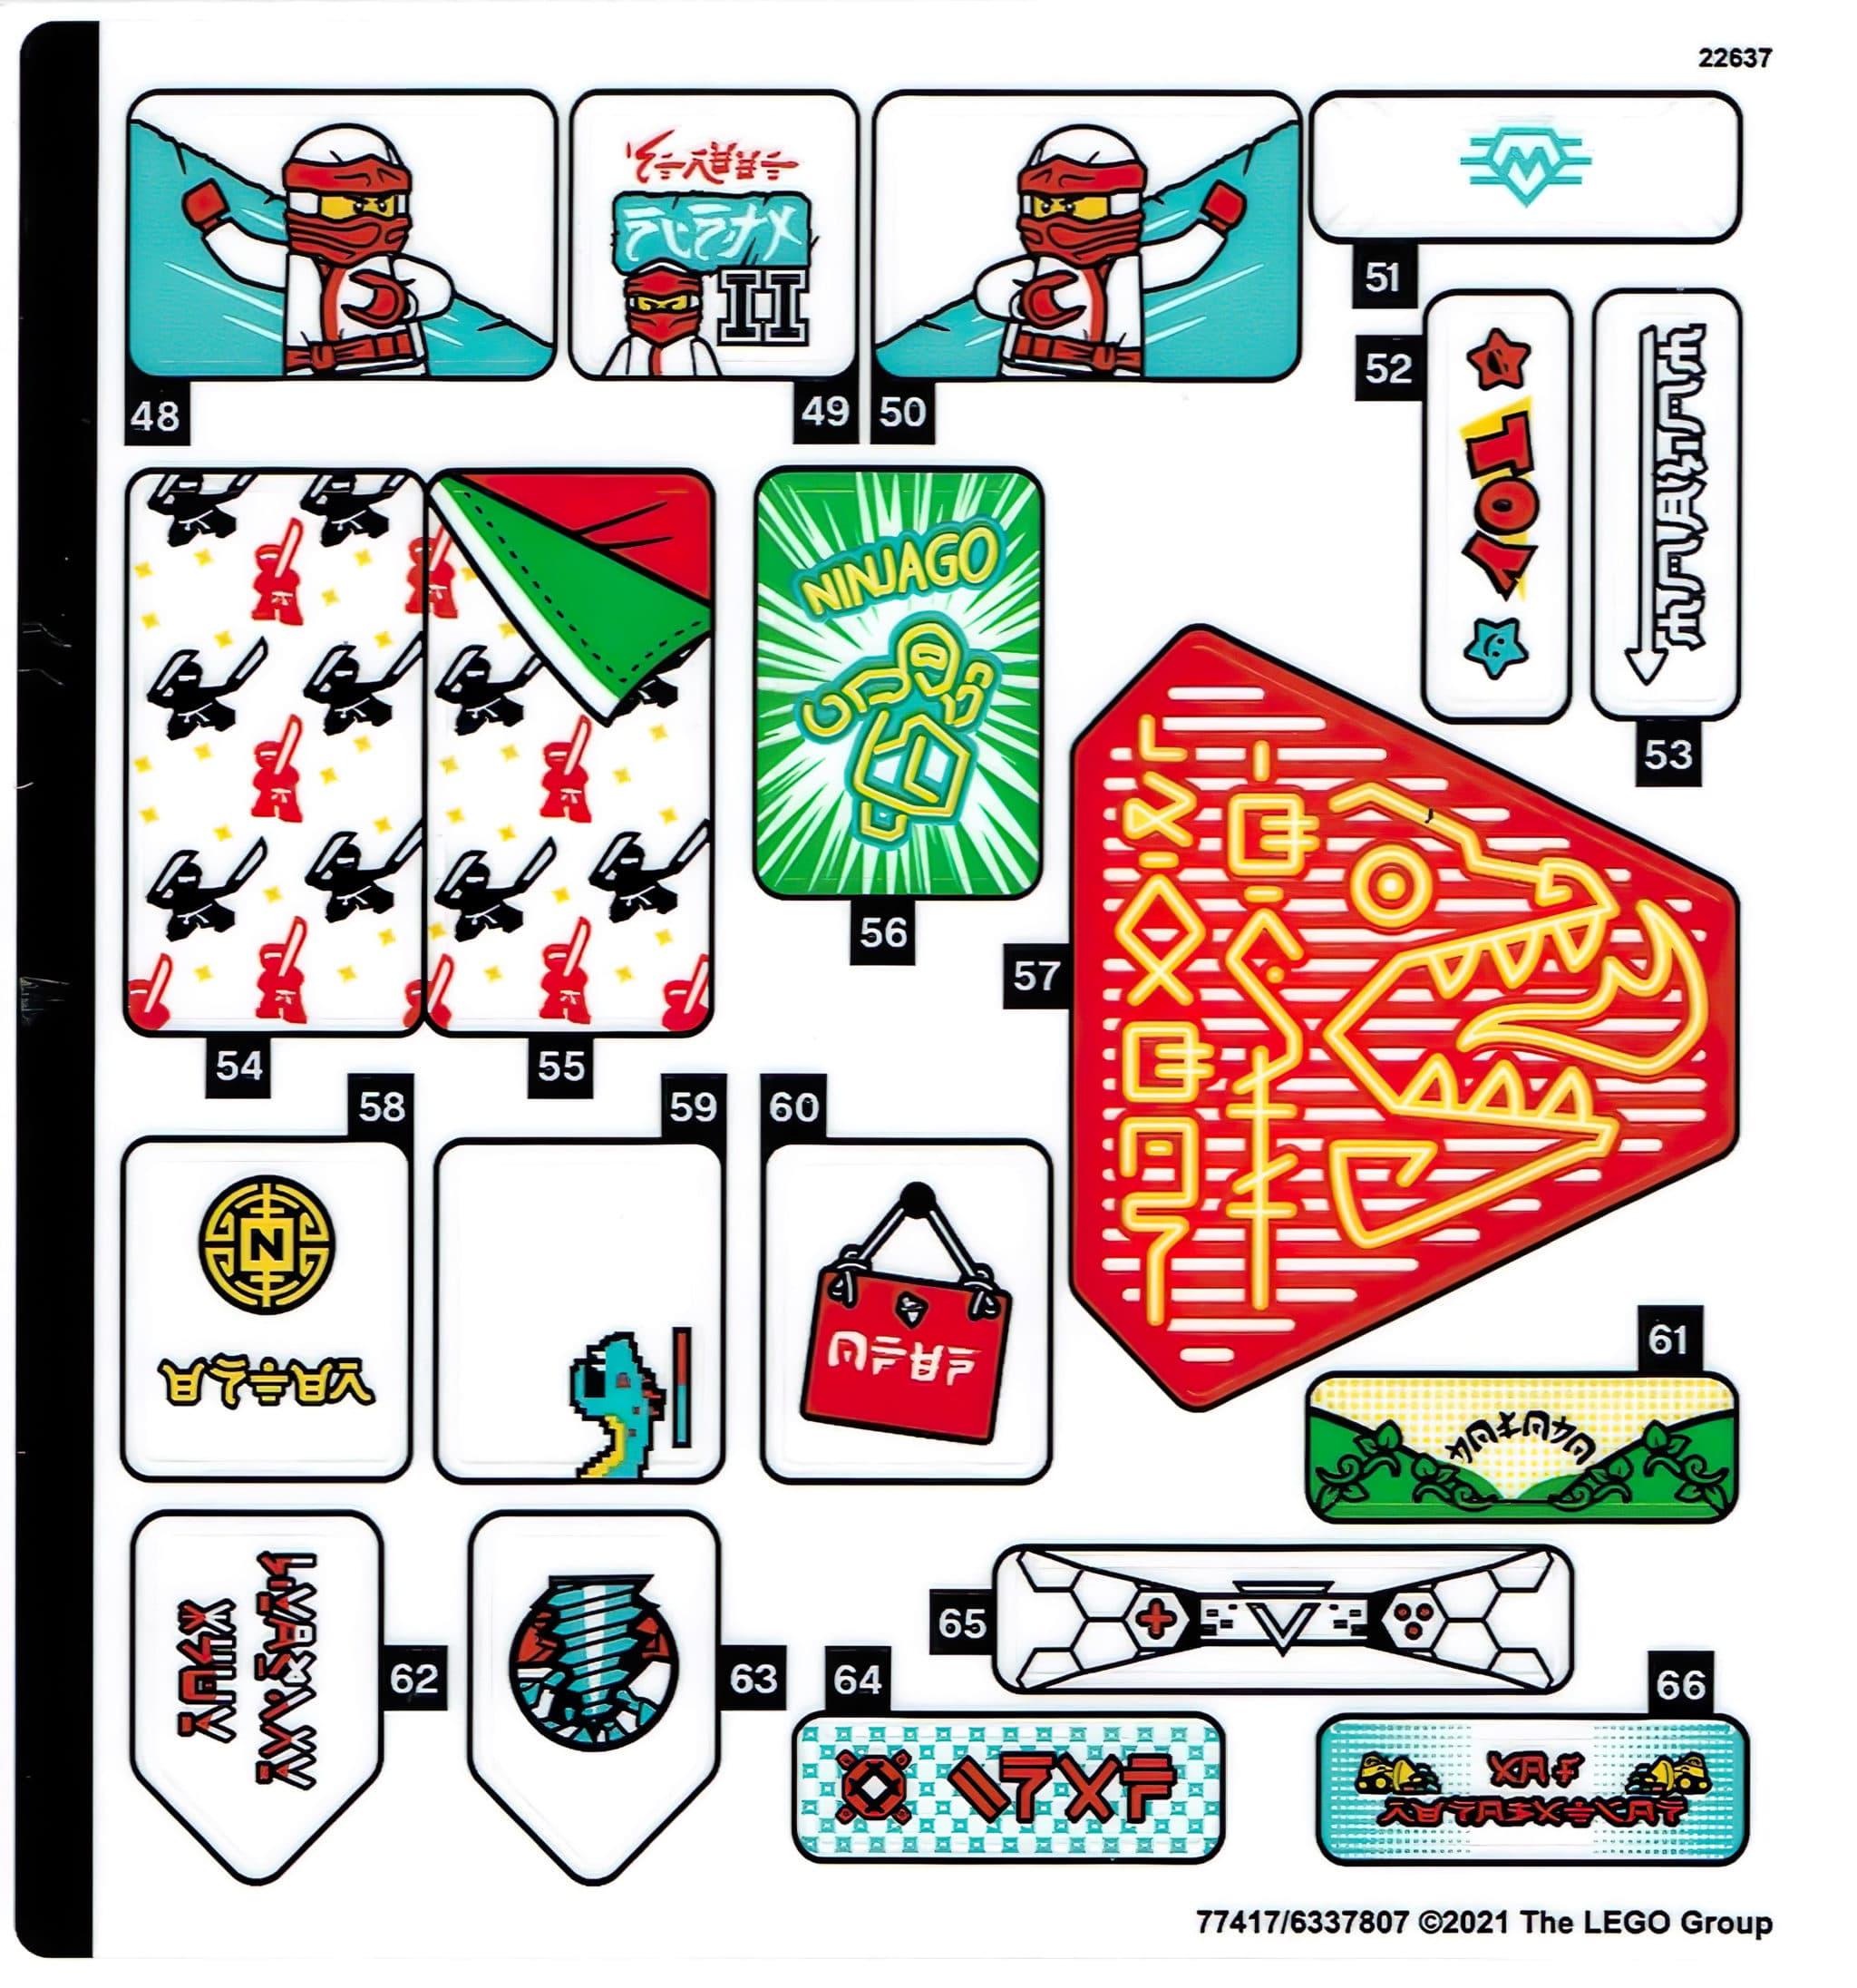 LEGO 71741 Ninjago City Gardens Sticker 3